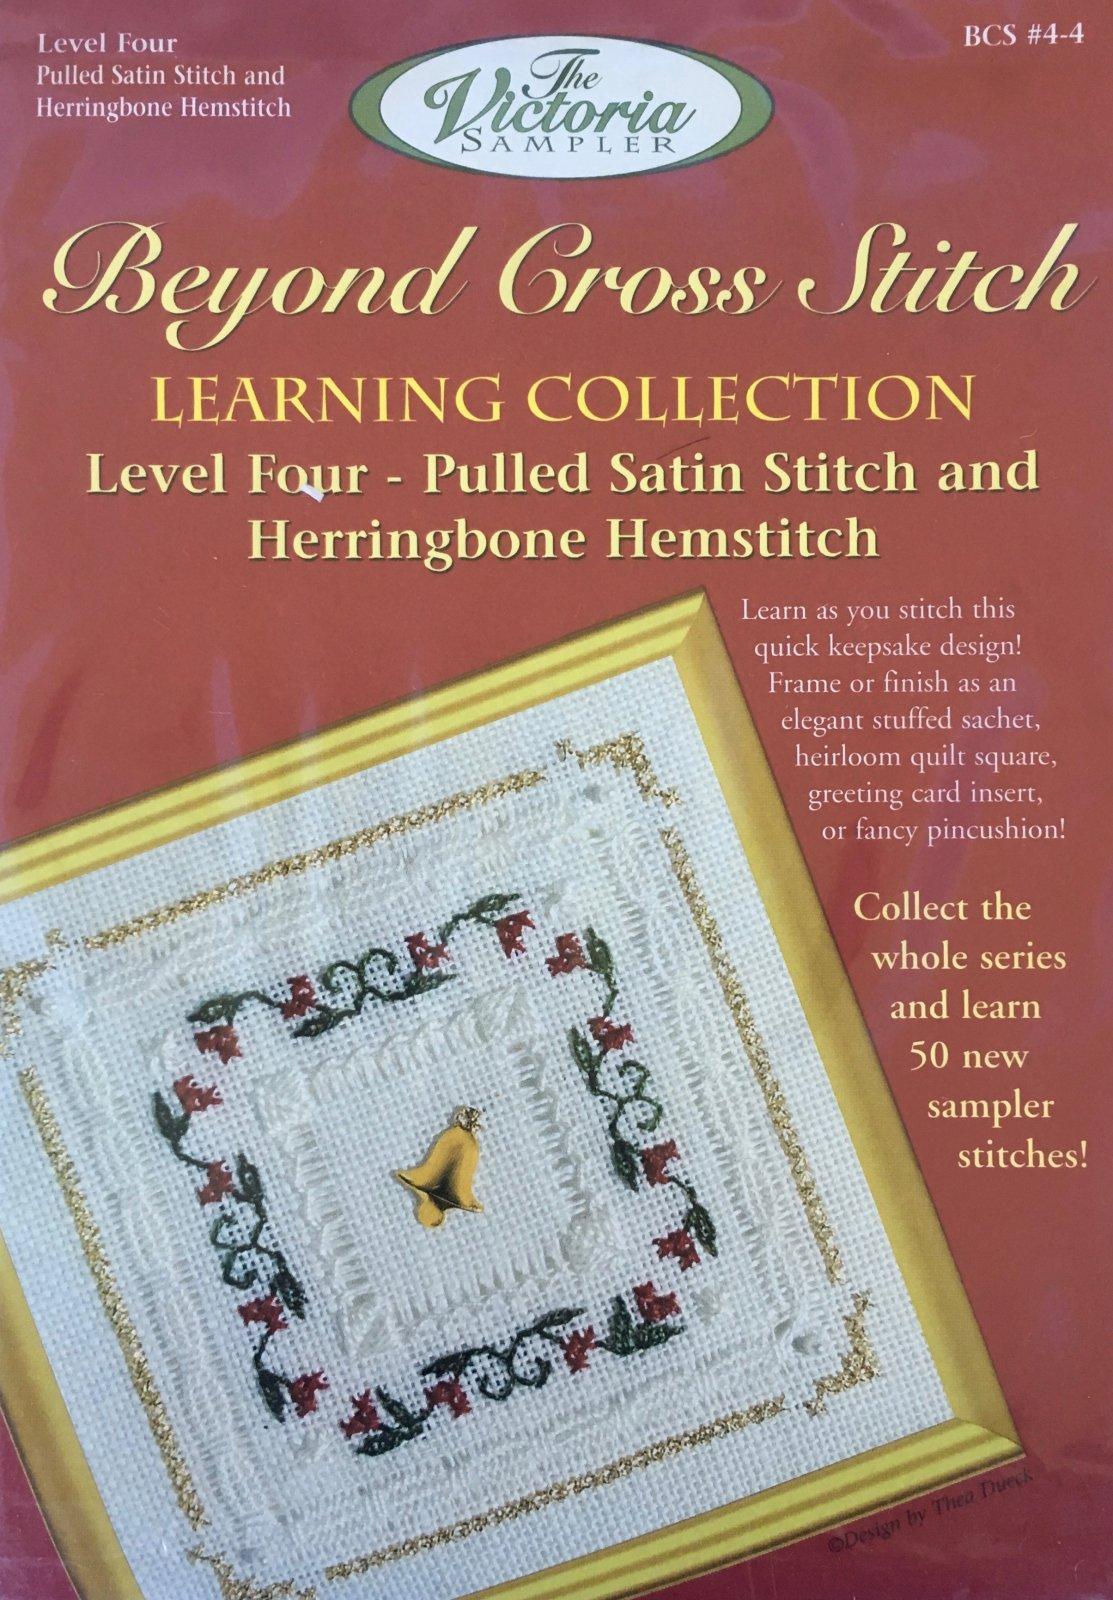 The Victoria Sampler: Christmas Floral Level 4 - #4 Kit; Pulled Satin Stitch & Herringbone Hemstitch